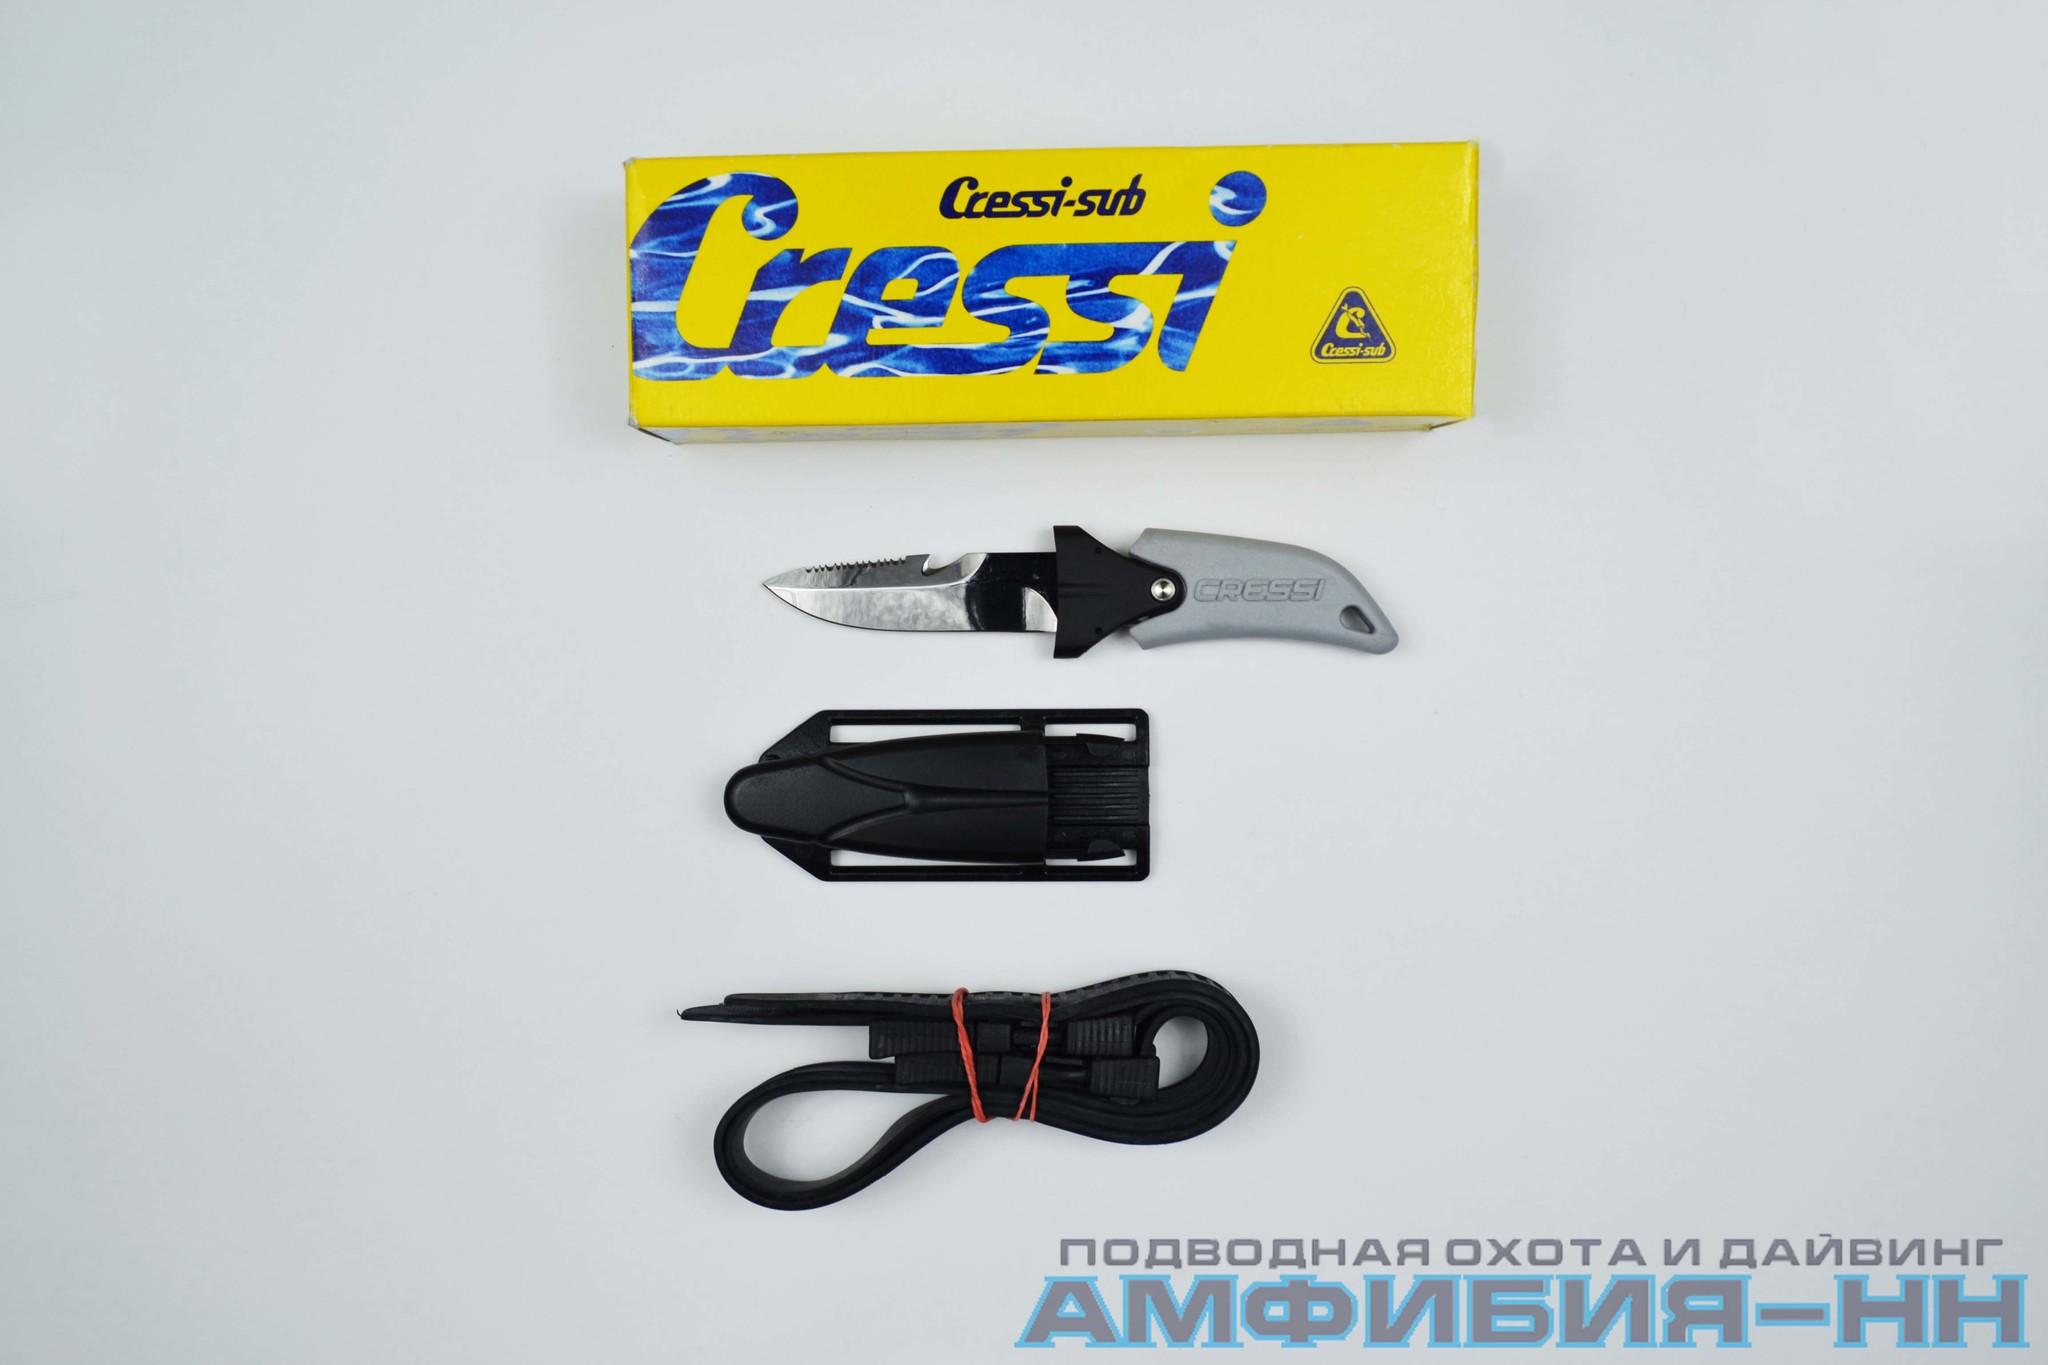 Нож Cressi Lama Apnea